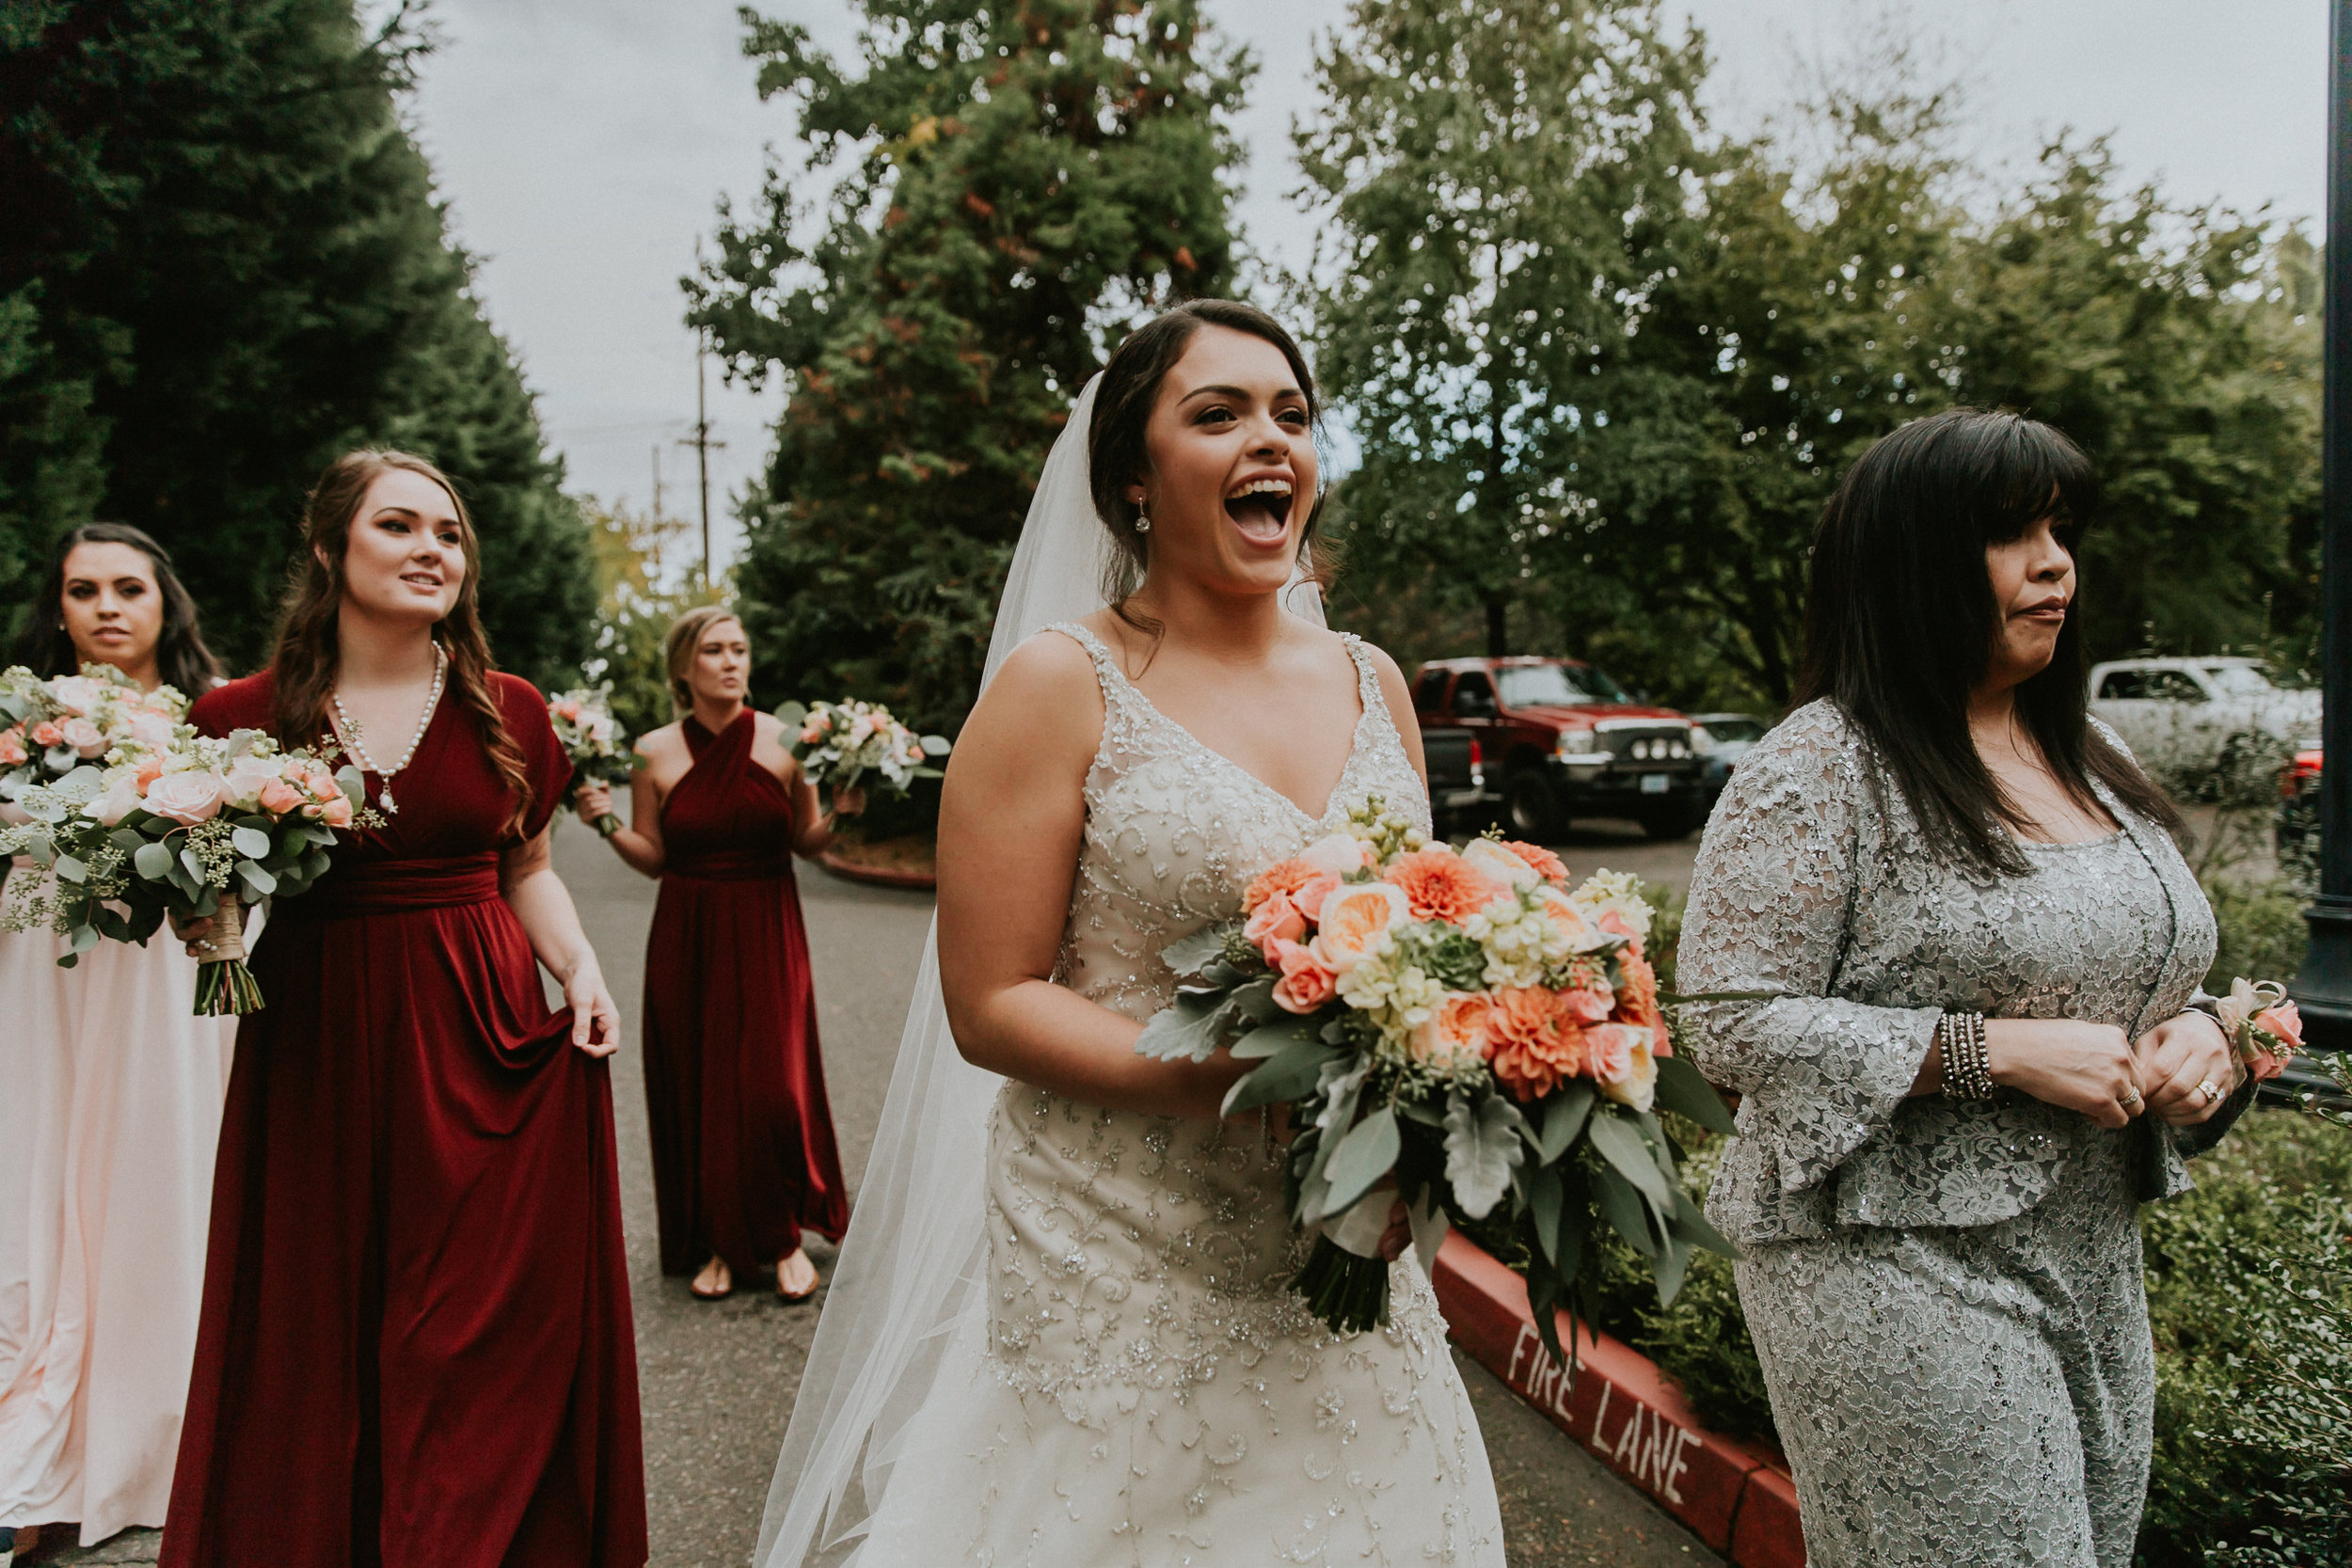 Portland_wedding_photographer_McMenamins_Alfred_Tang-56.jpg